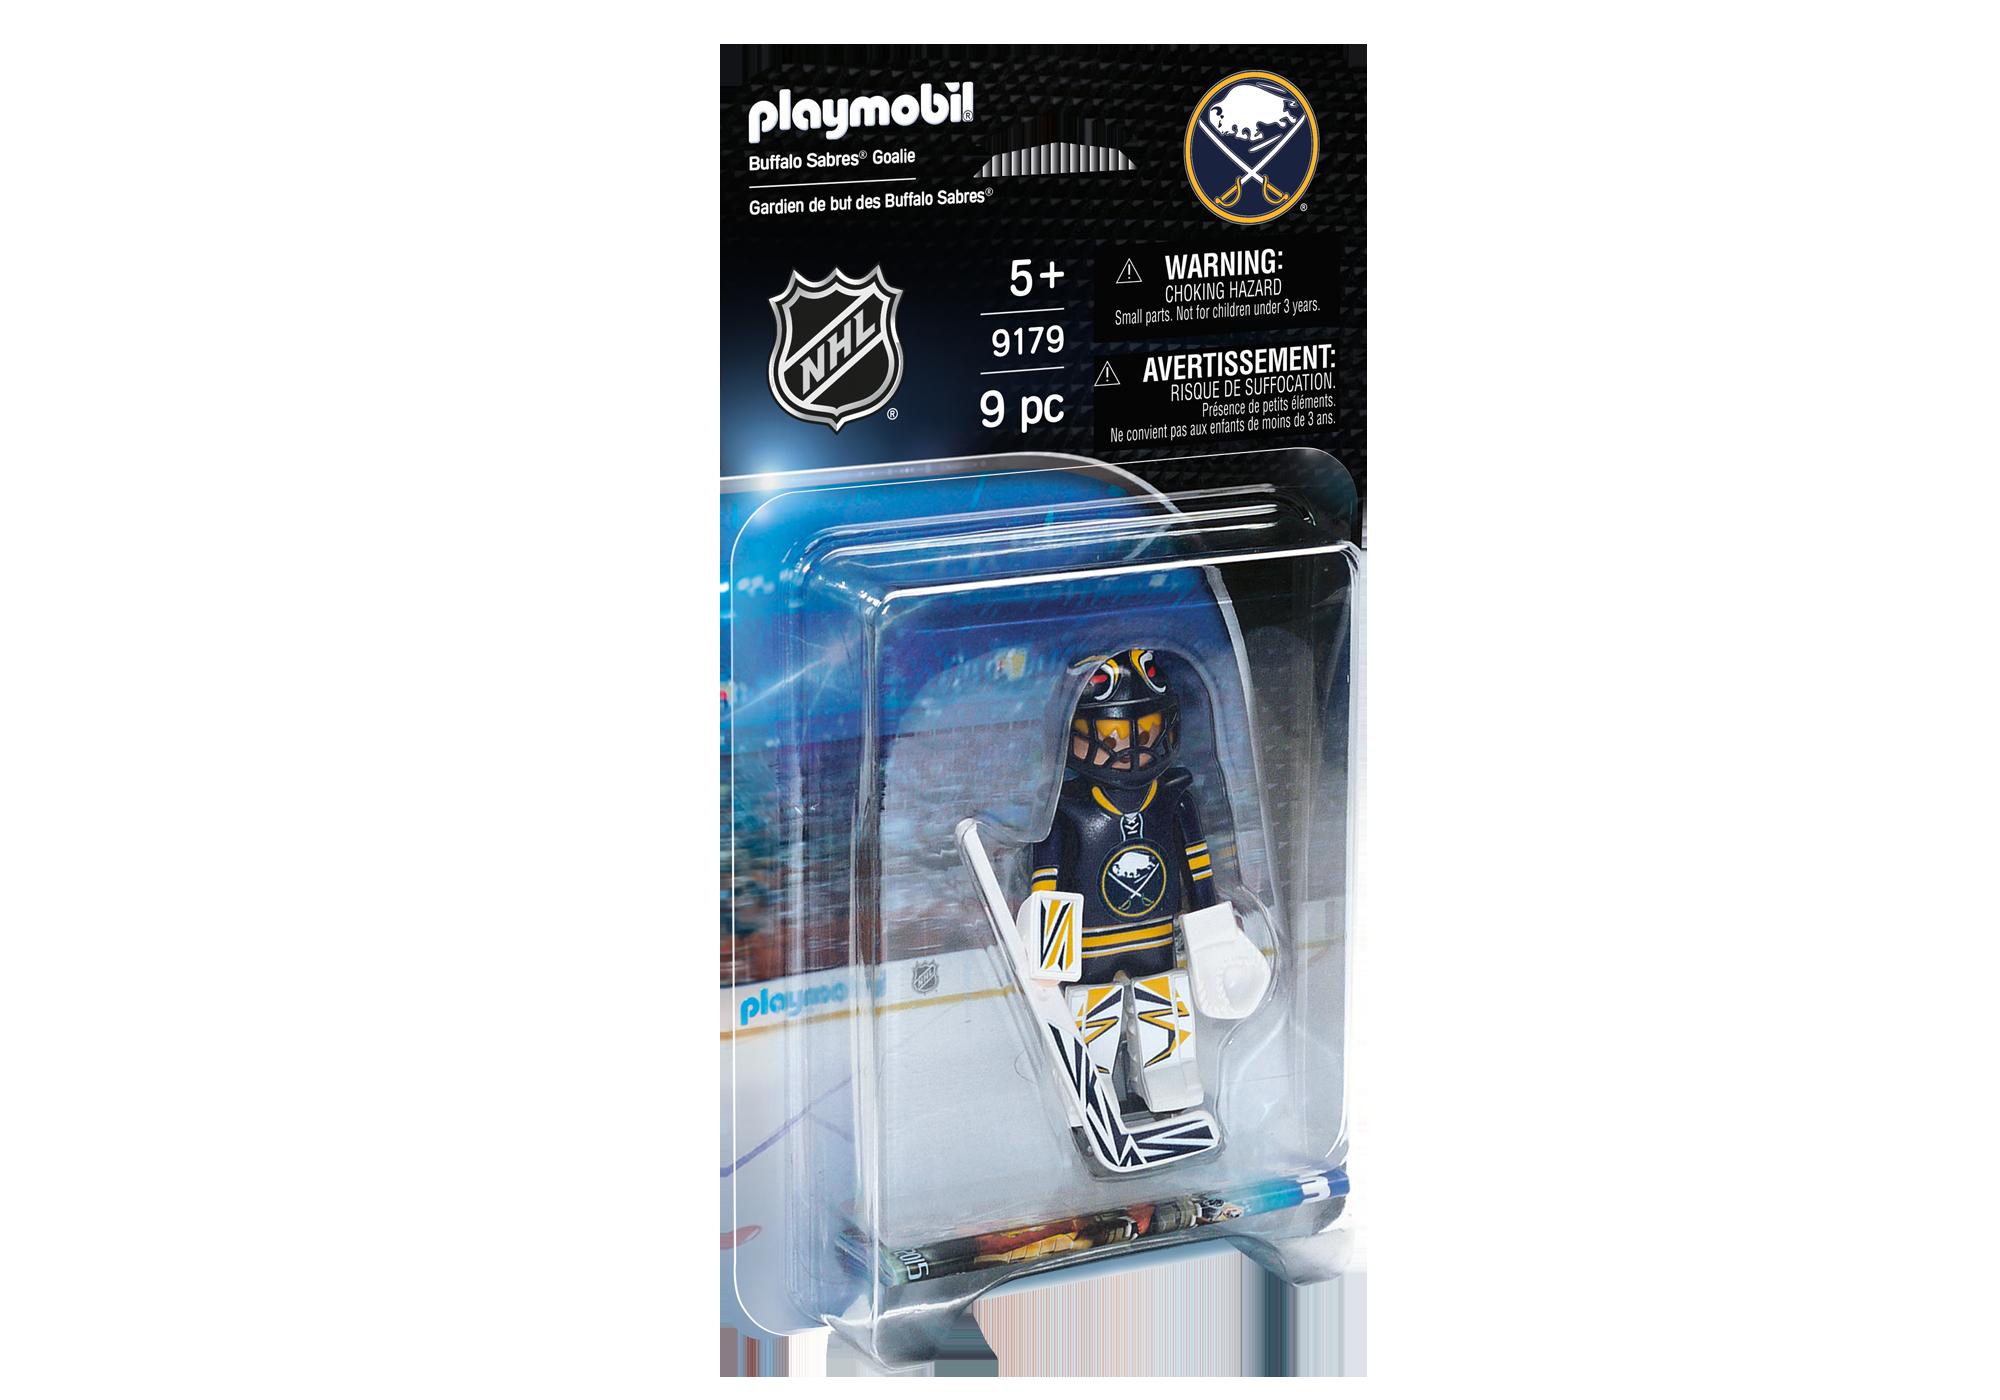 http://media.playmobil.com/i/playmobil/9179_product_box_front/NHL™ Buffalo Sabres™ Goalie